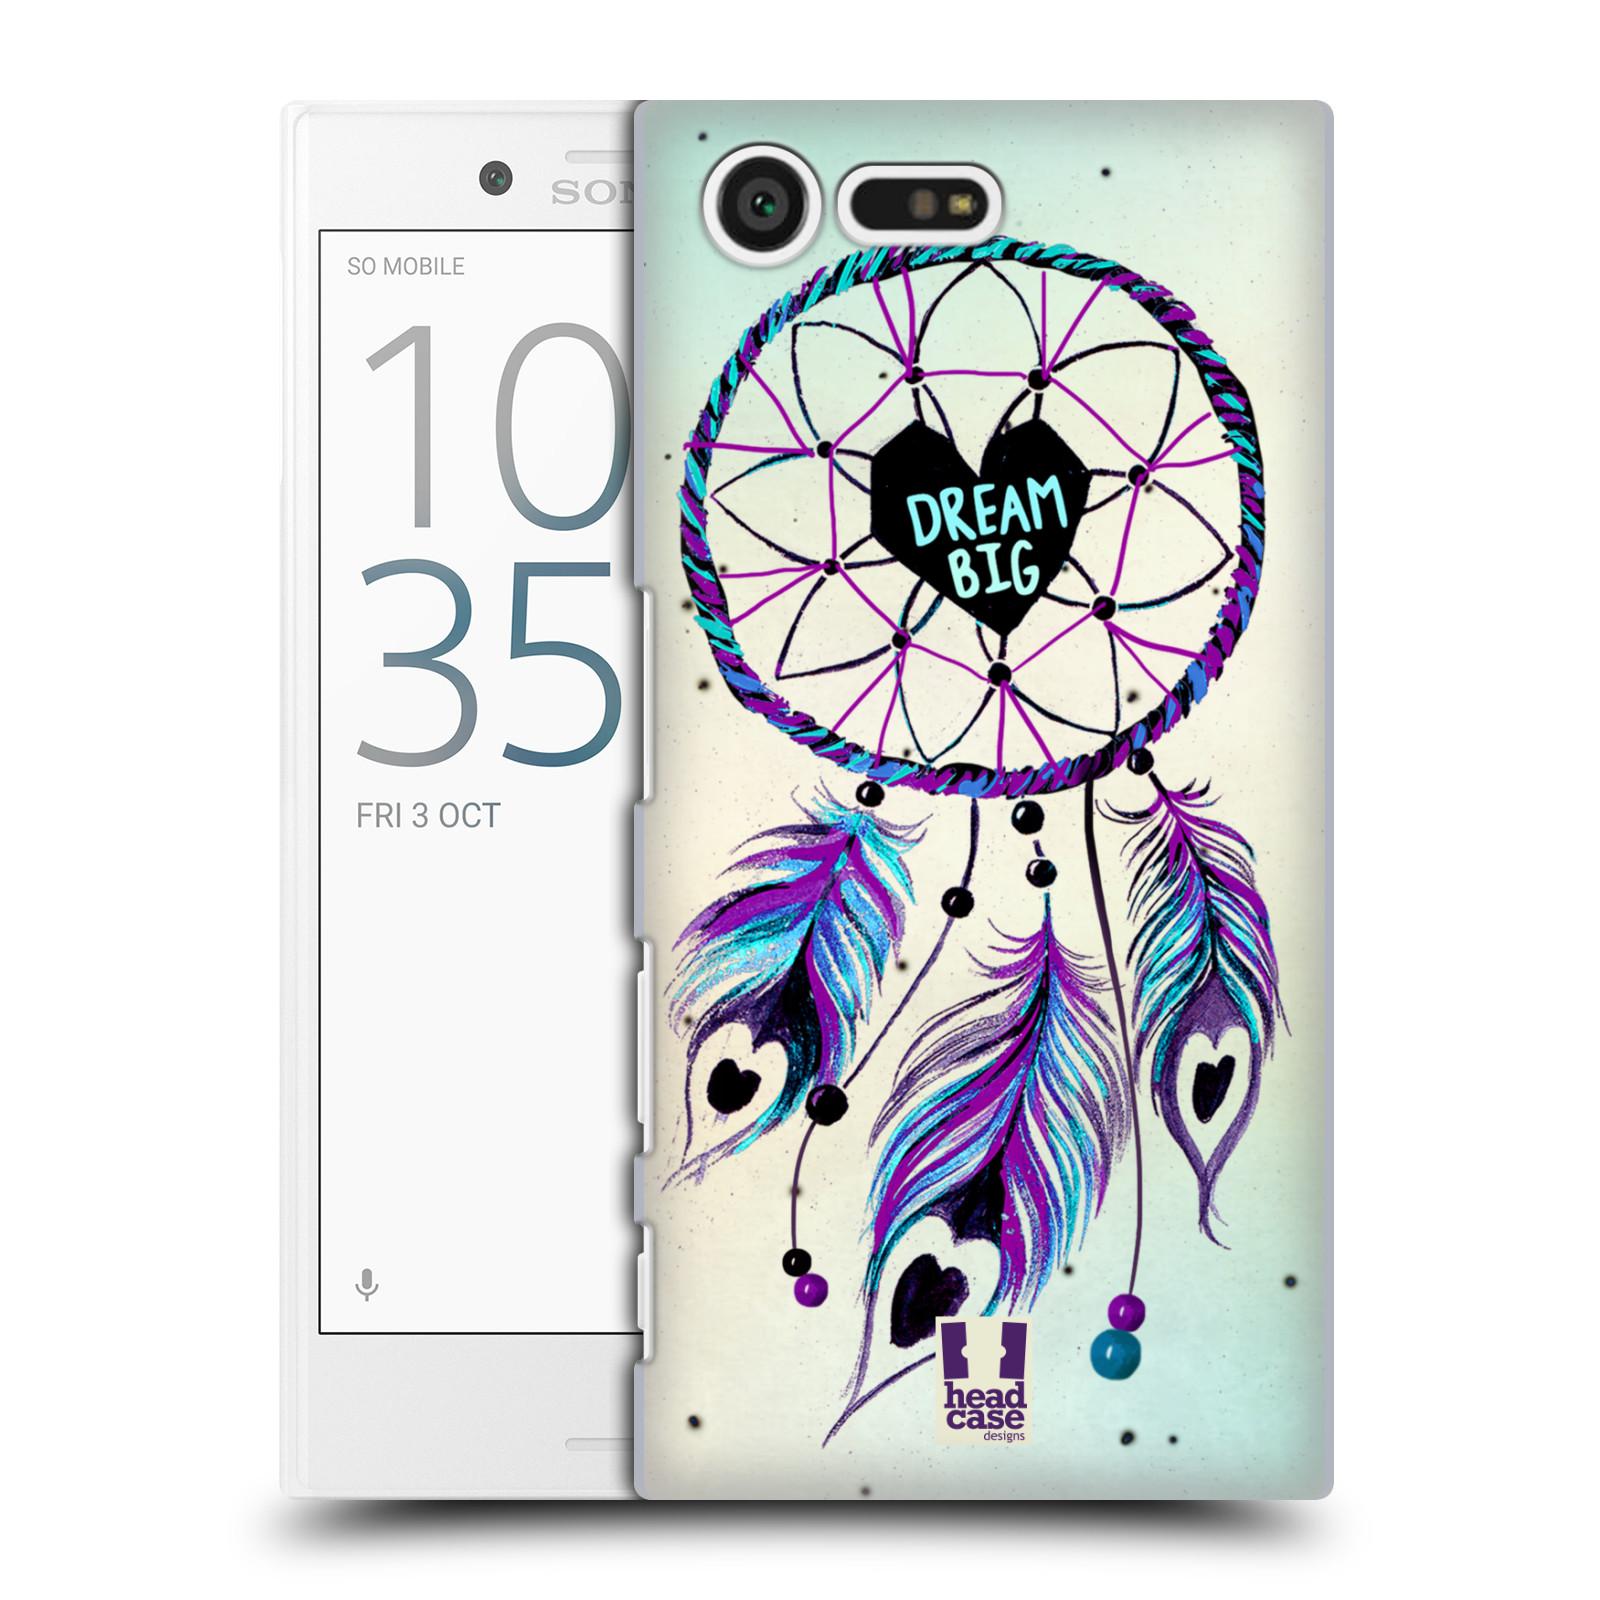 Plastové pouzdro na mobil Sony Xperia X Compact HEAD CASE Lapač Assorted Dream Big Srdce